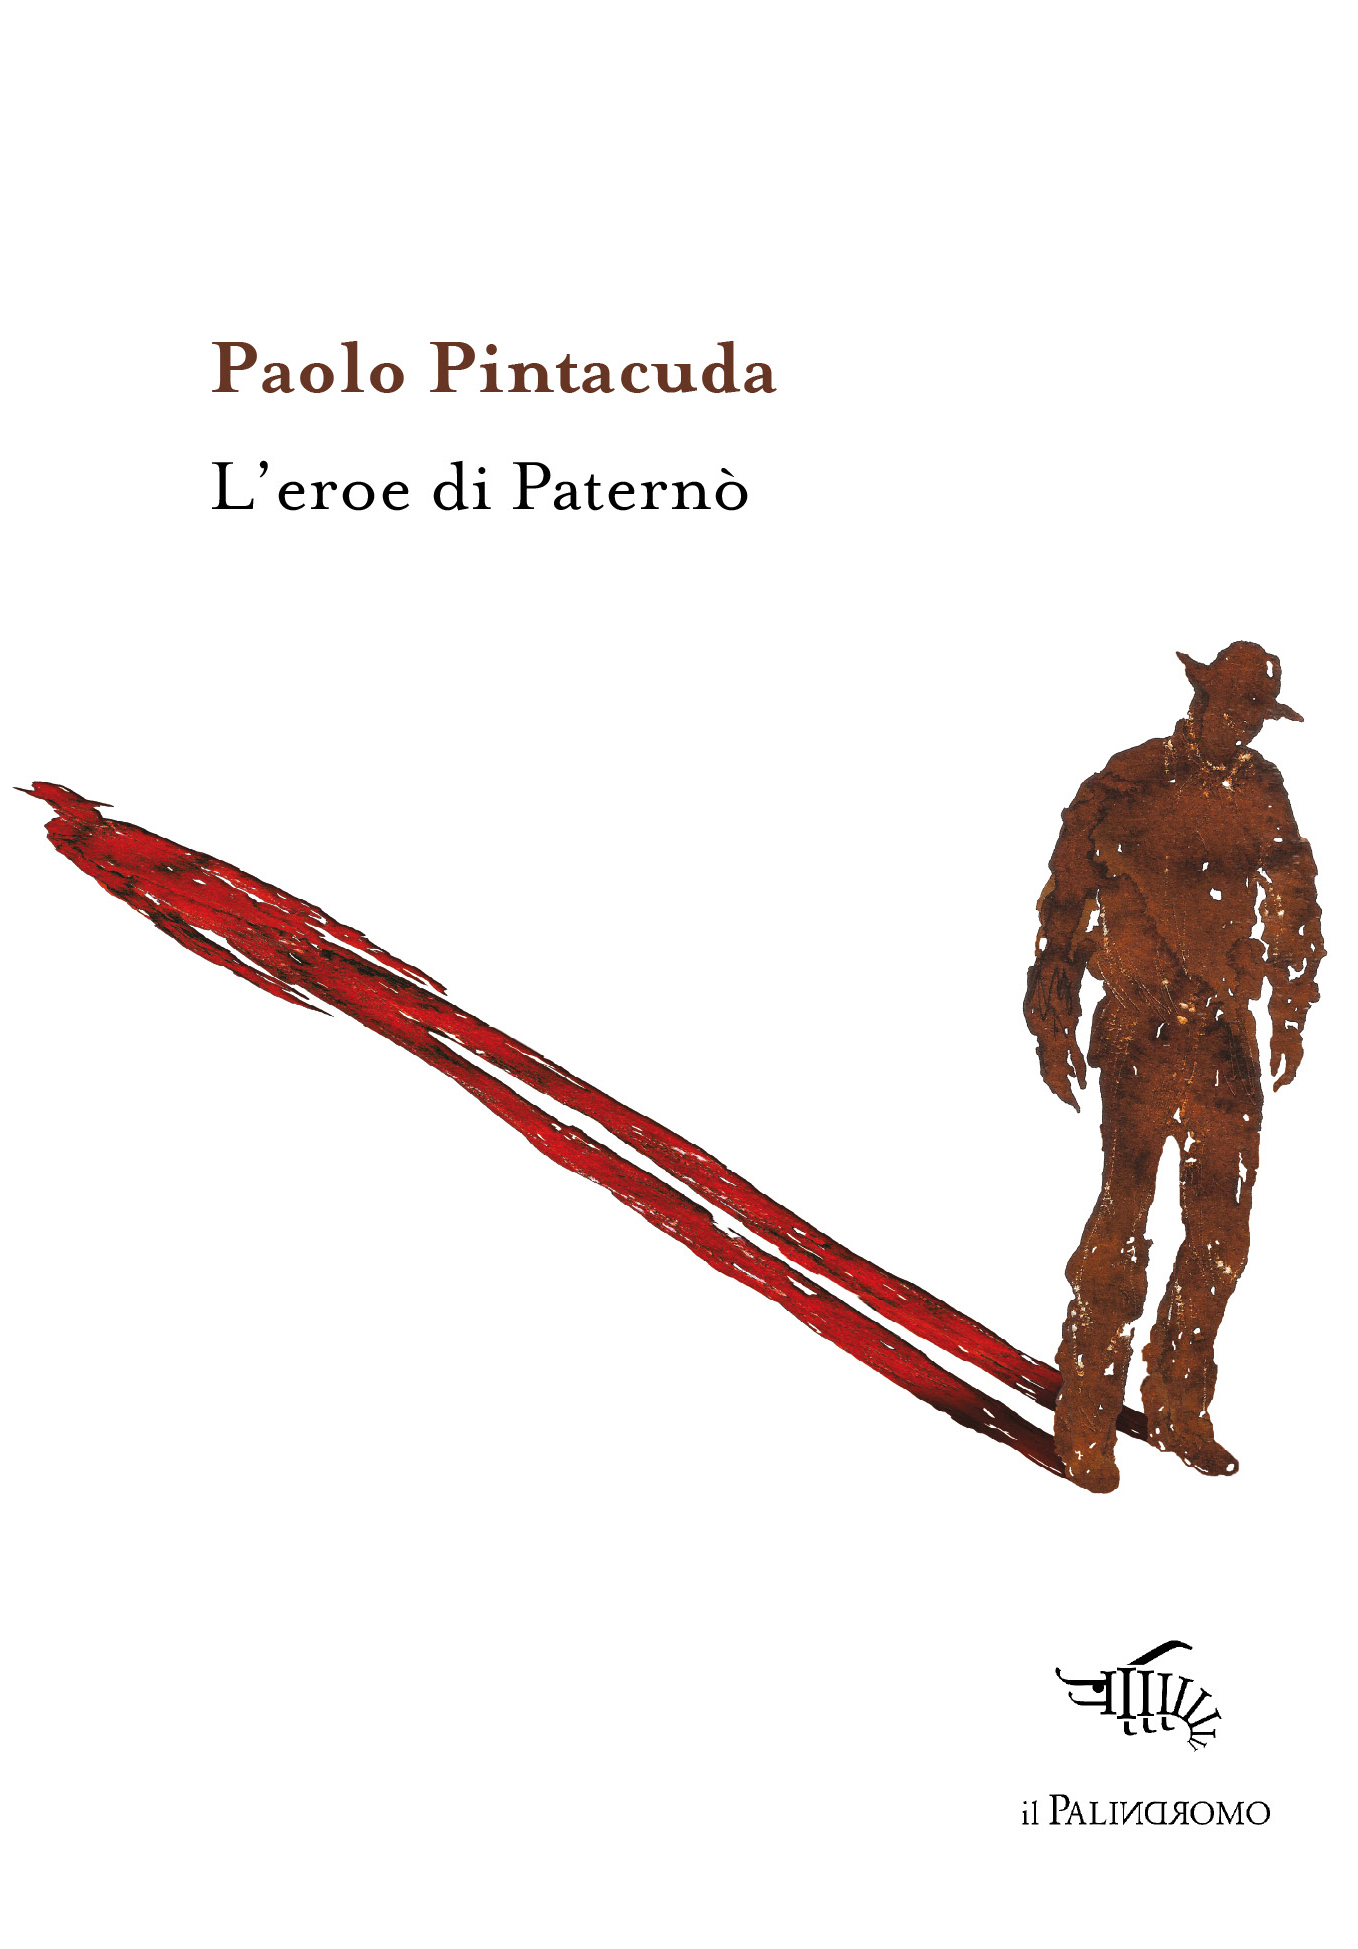 Autore: Paolo Pintacuda